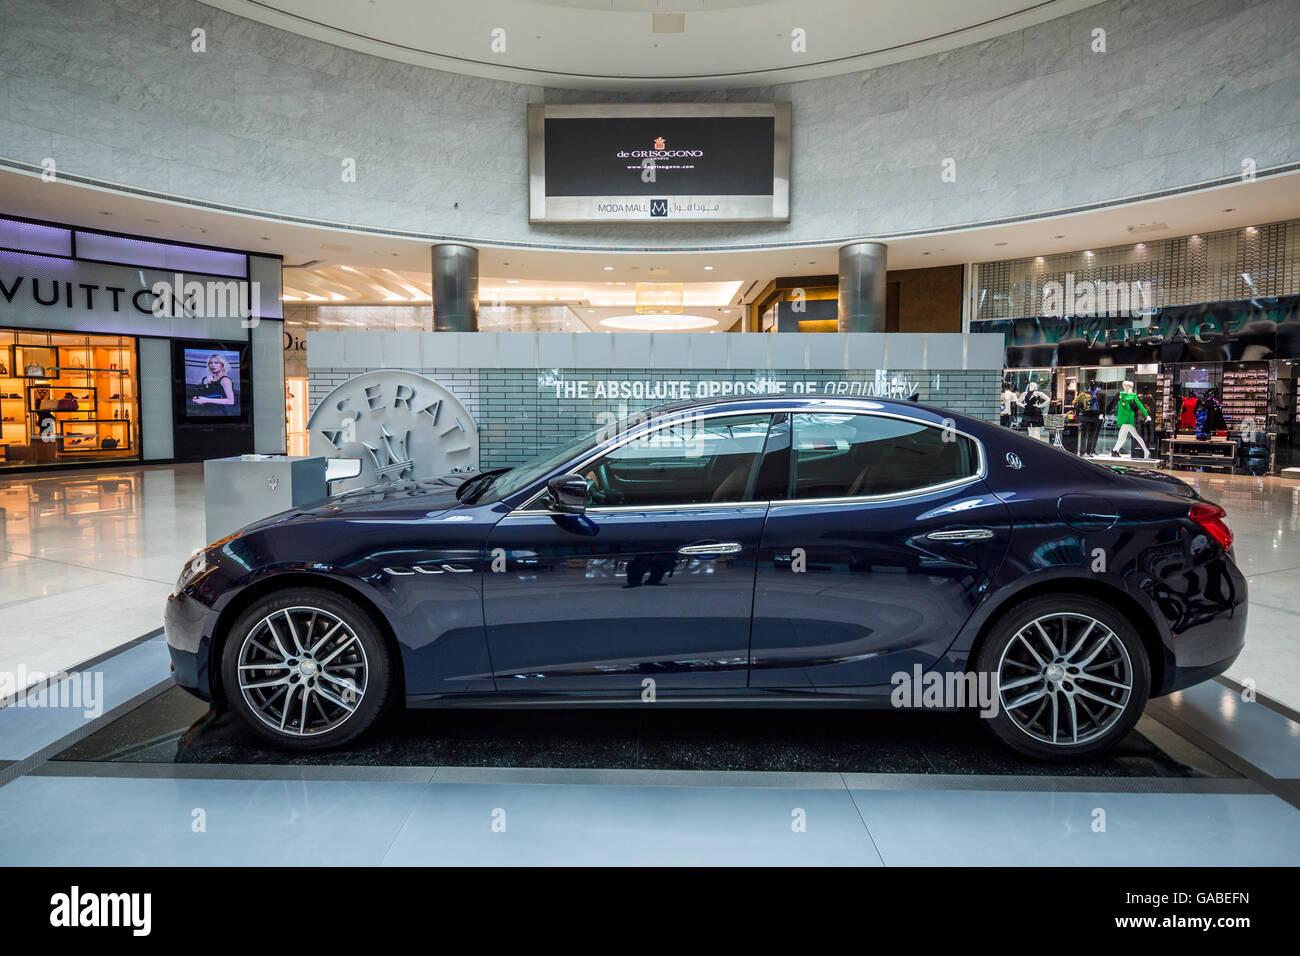 Maserati Ghibli, Fashion Mall, el Centro de Comercio Mundial de Bahrein, Manama, Bahrein. Imagen De Stock